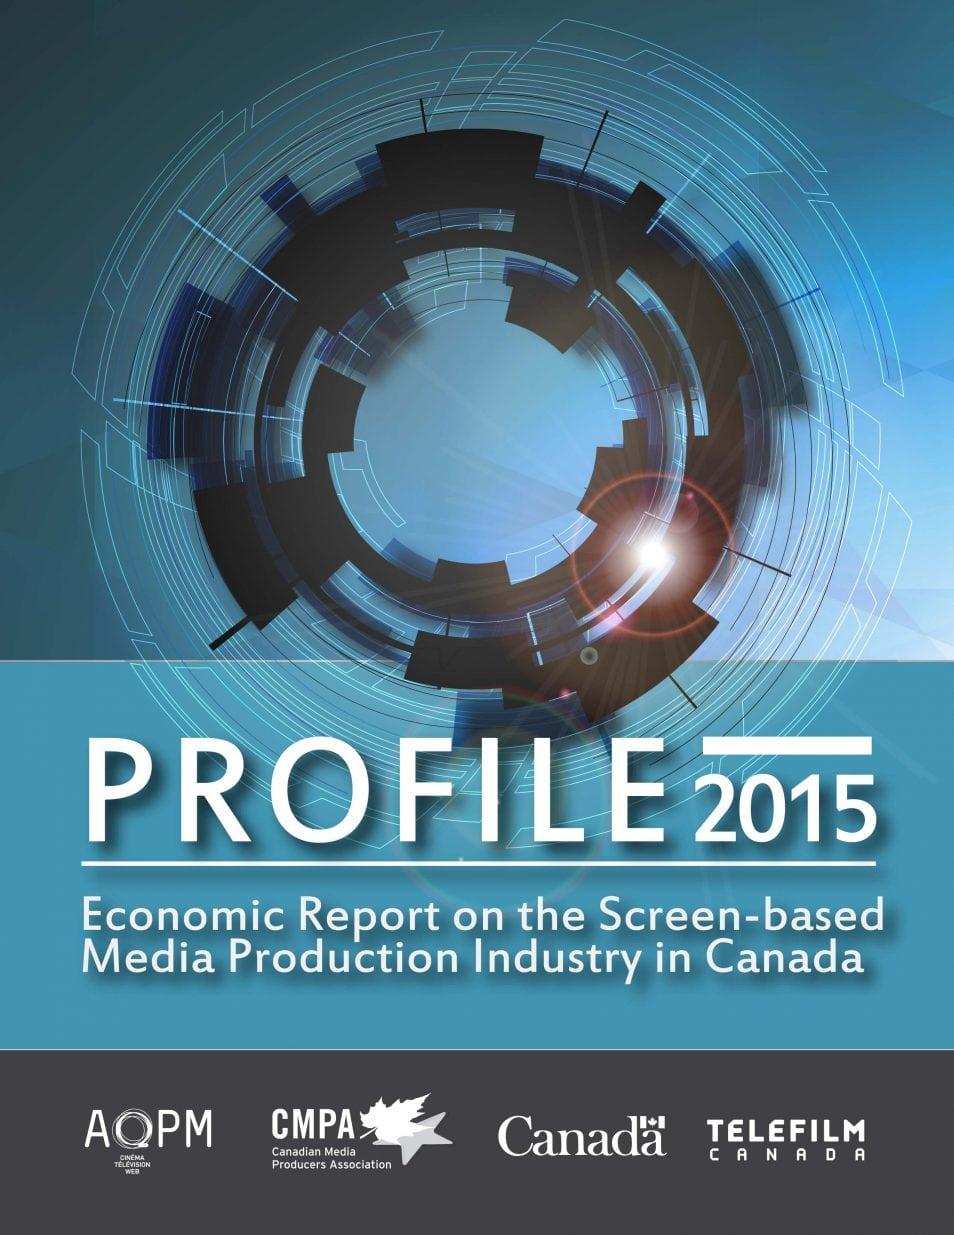 profile-2015-economic-report